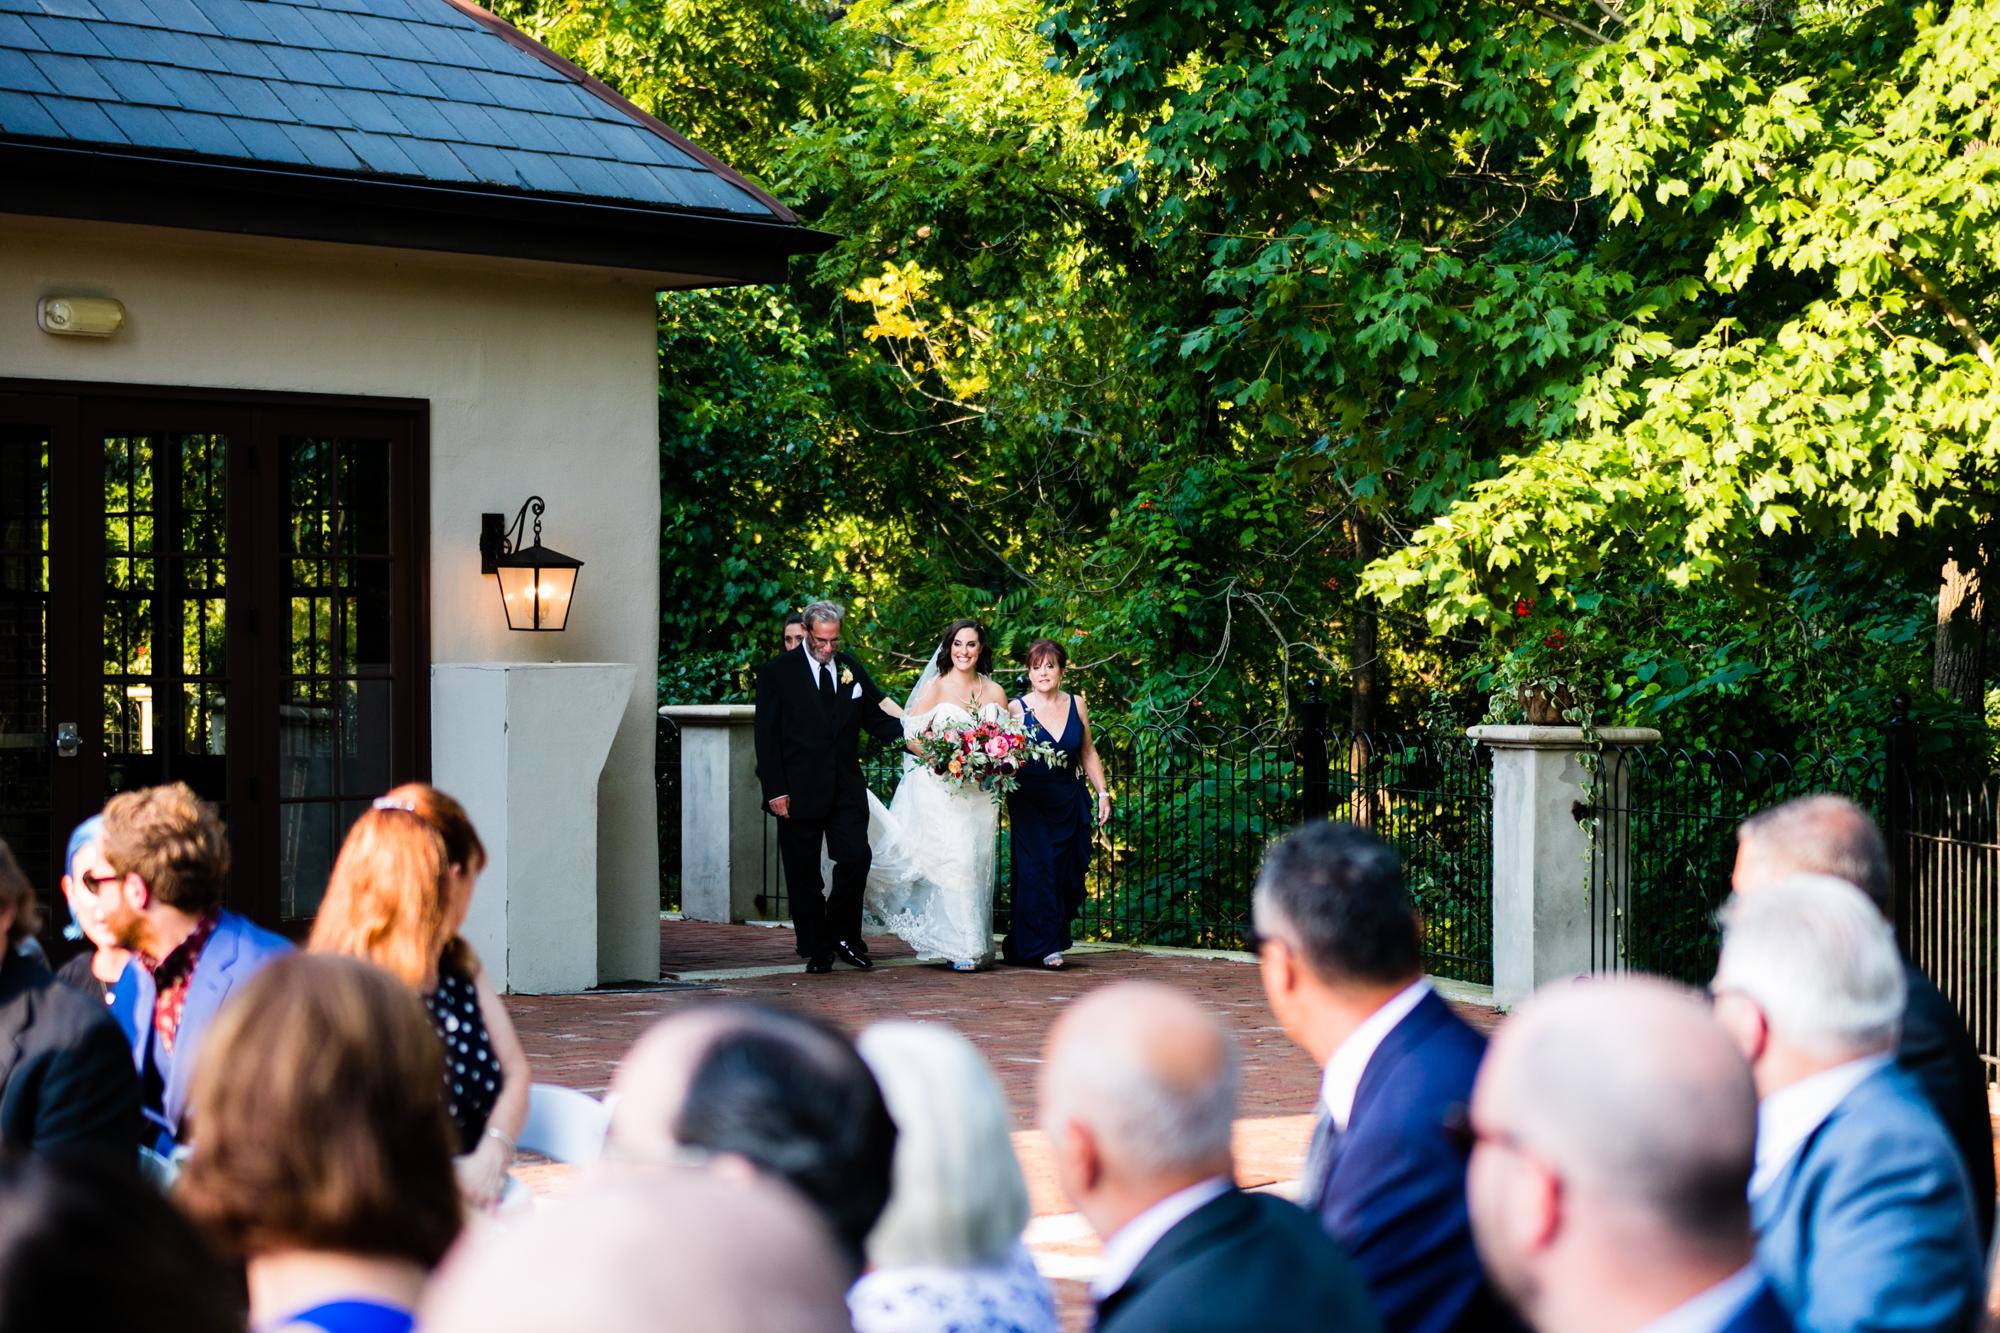 Hotel Du Village - LoveStruck Pictures - Wedding Photography-063.jpg